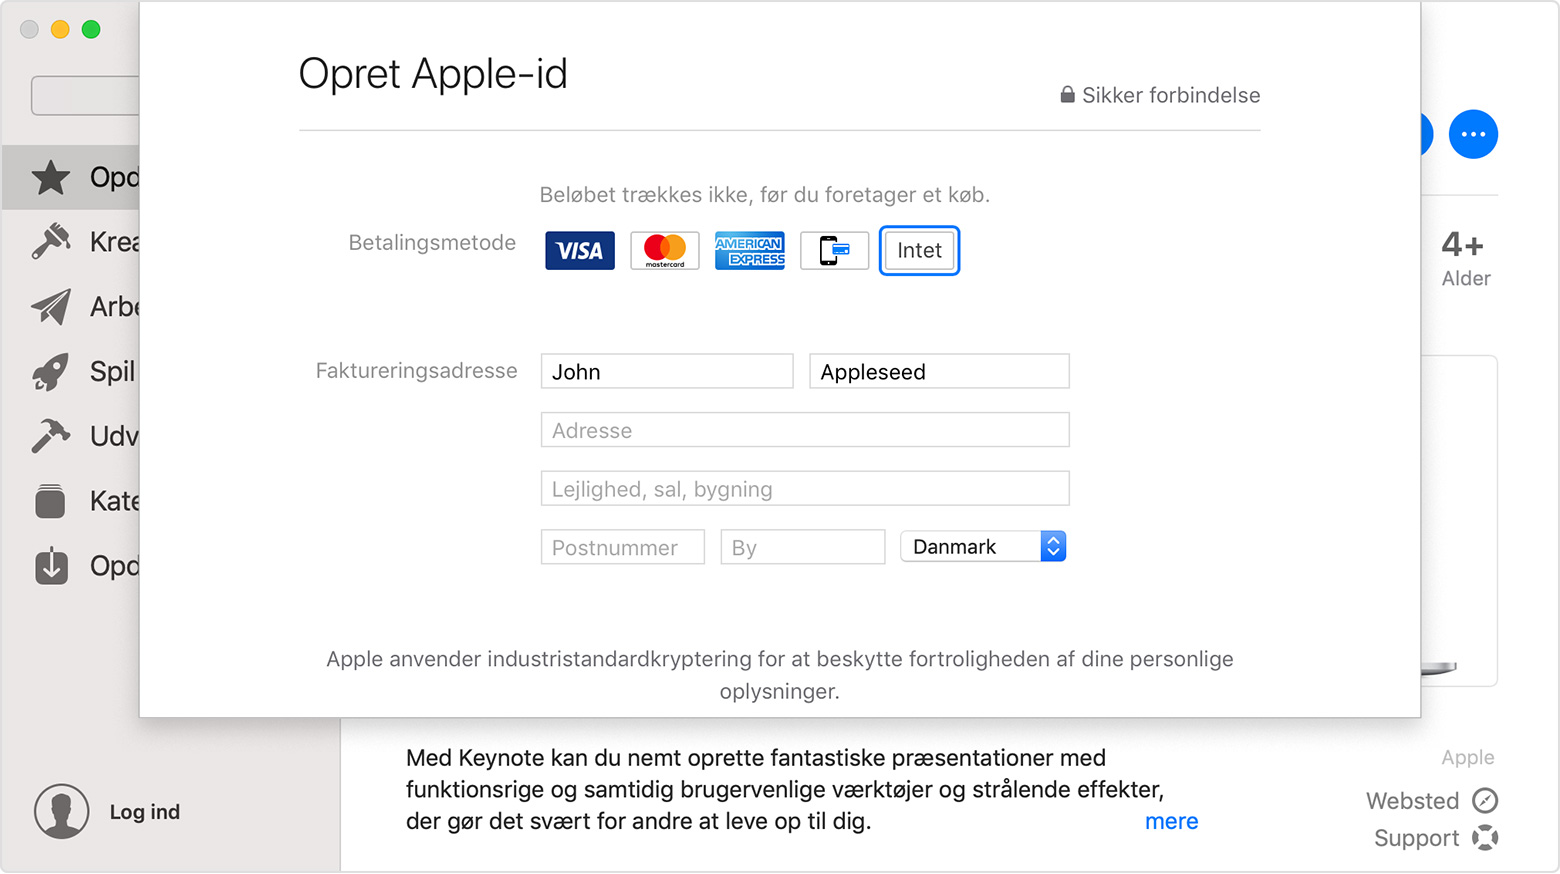 apple id alder